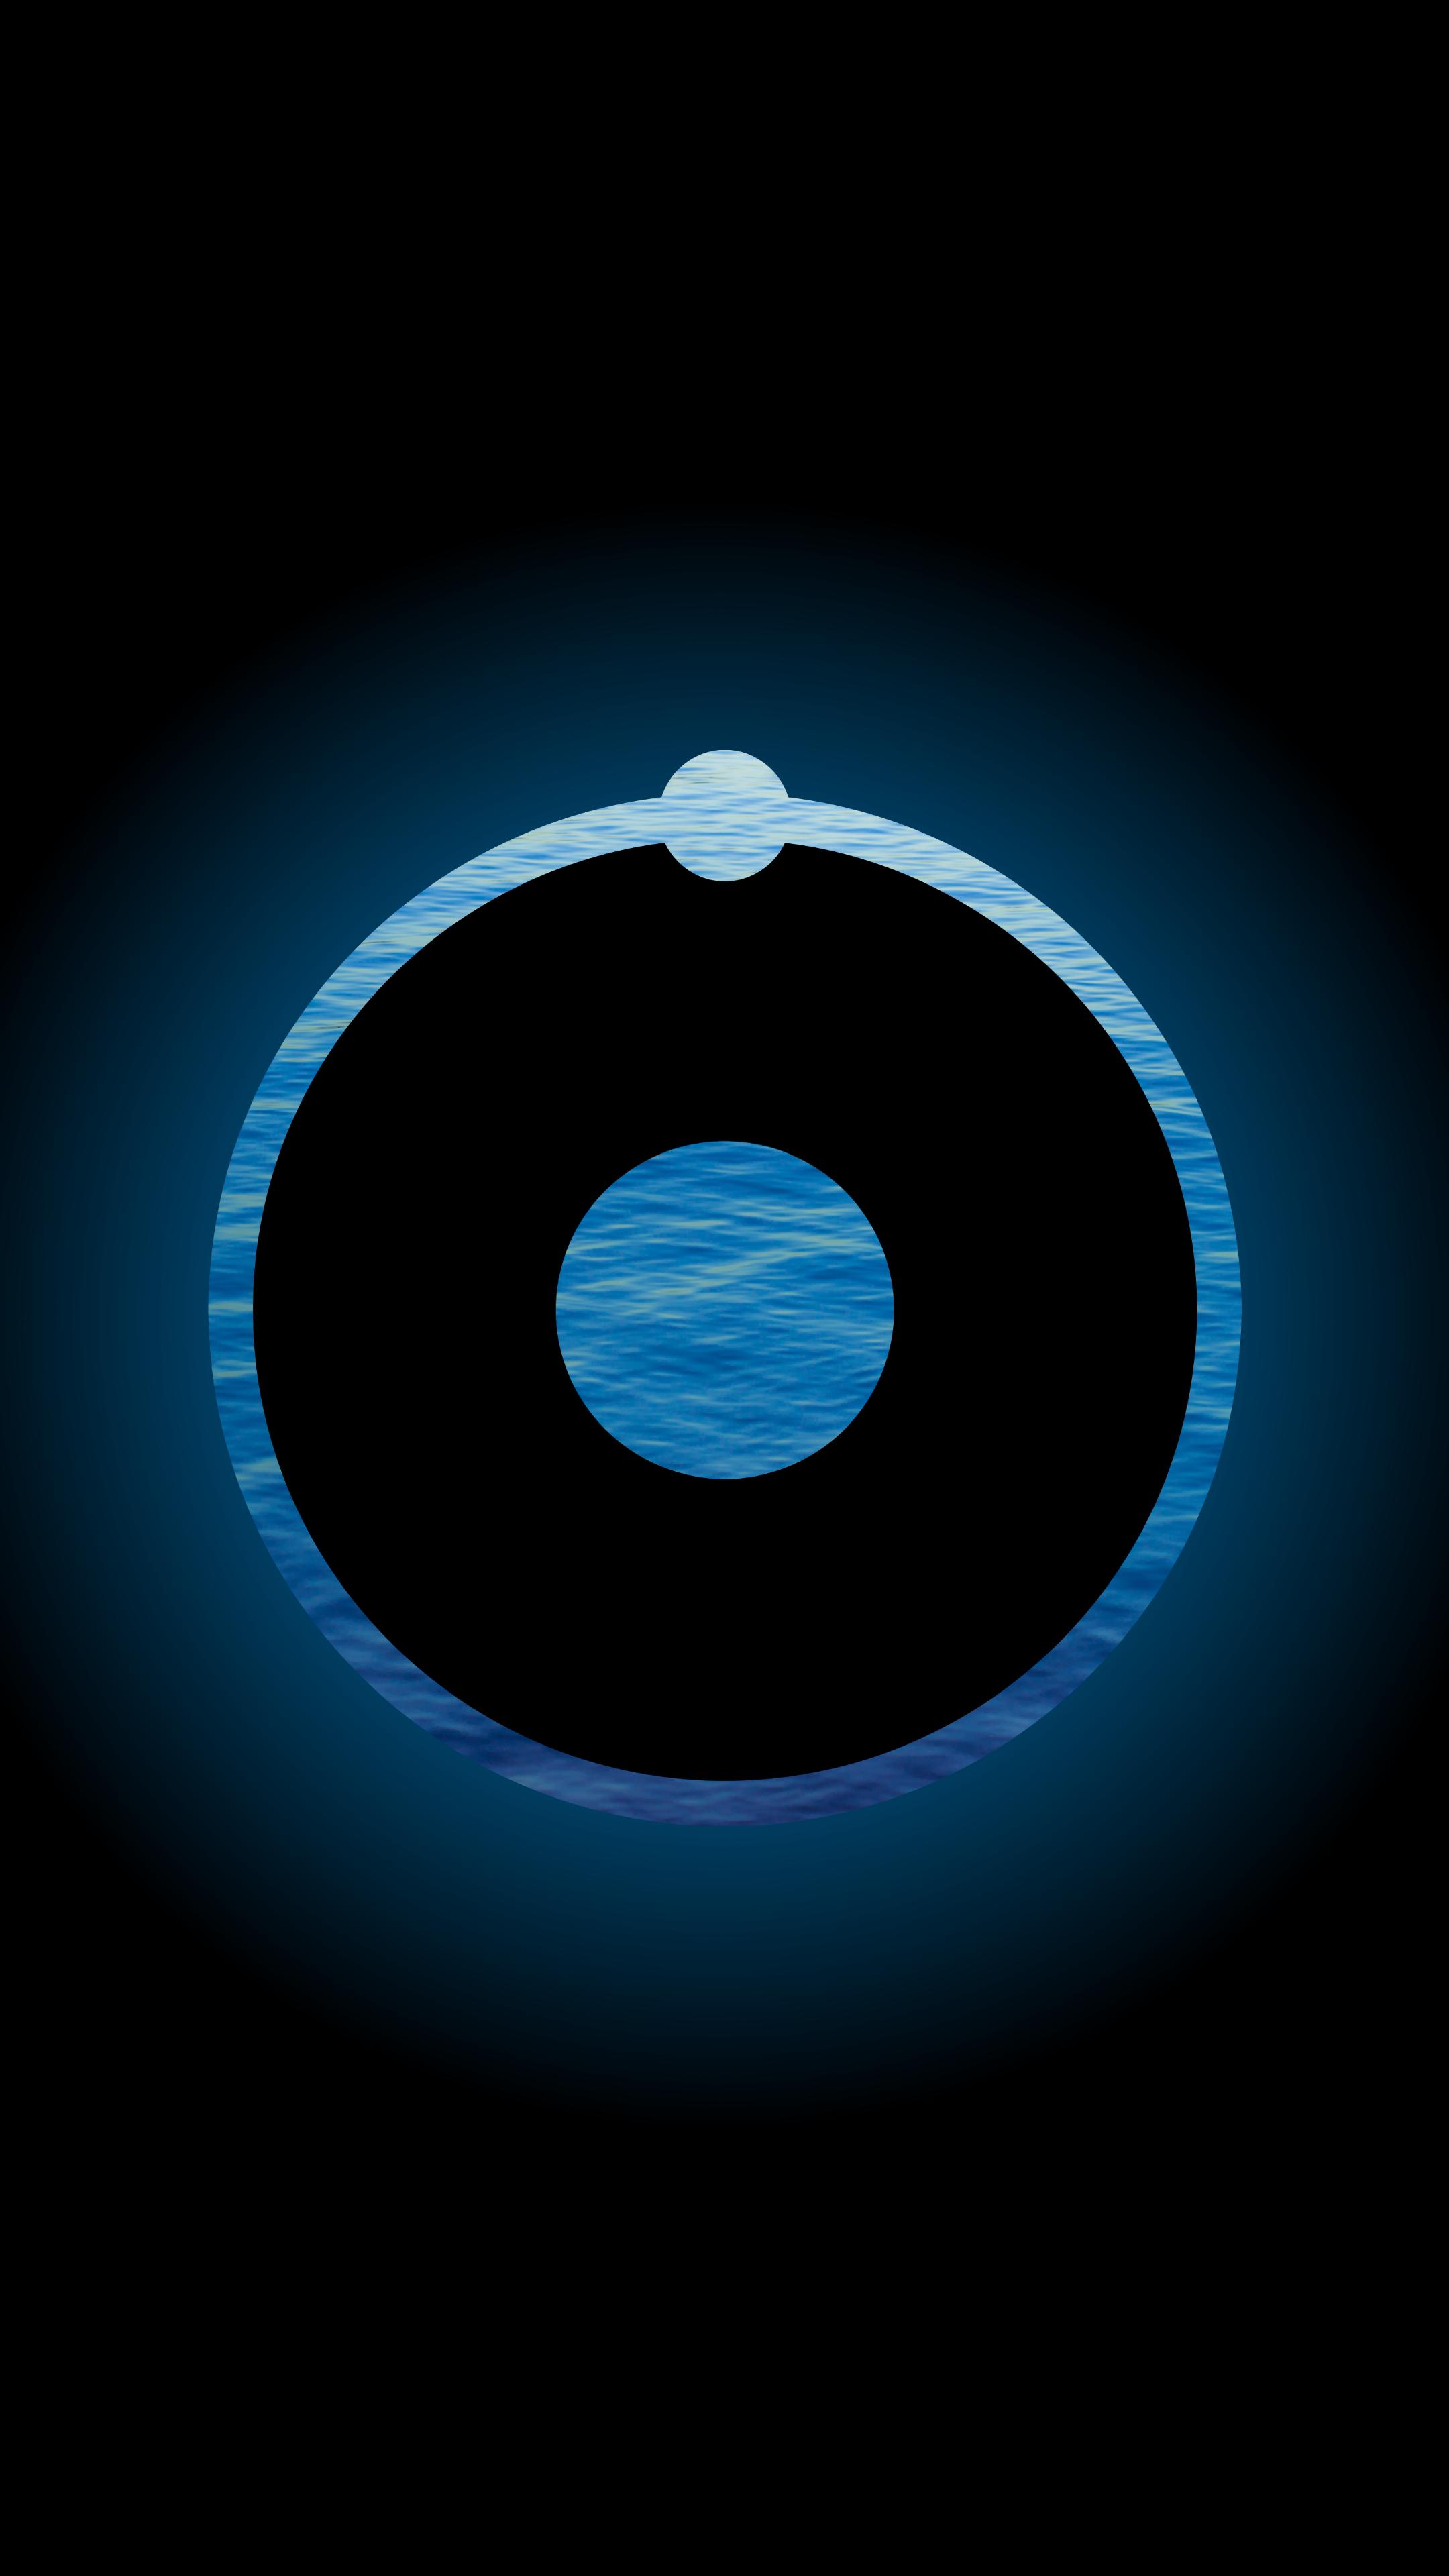 Dr. Manhattan logo.